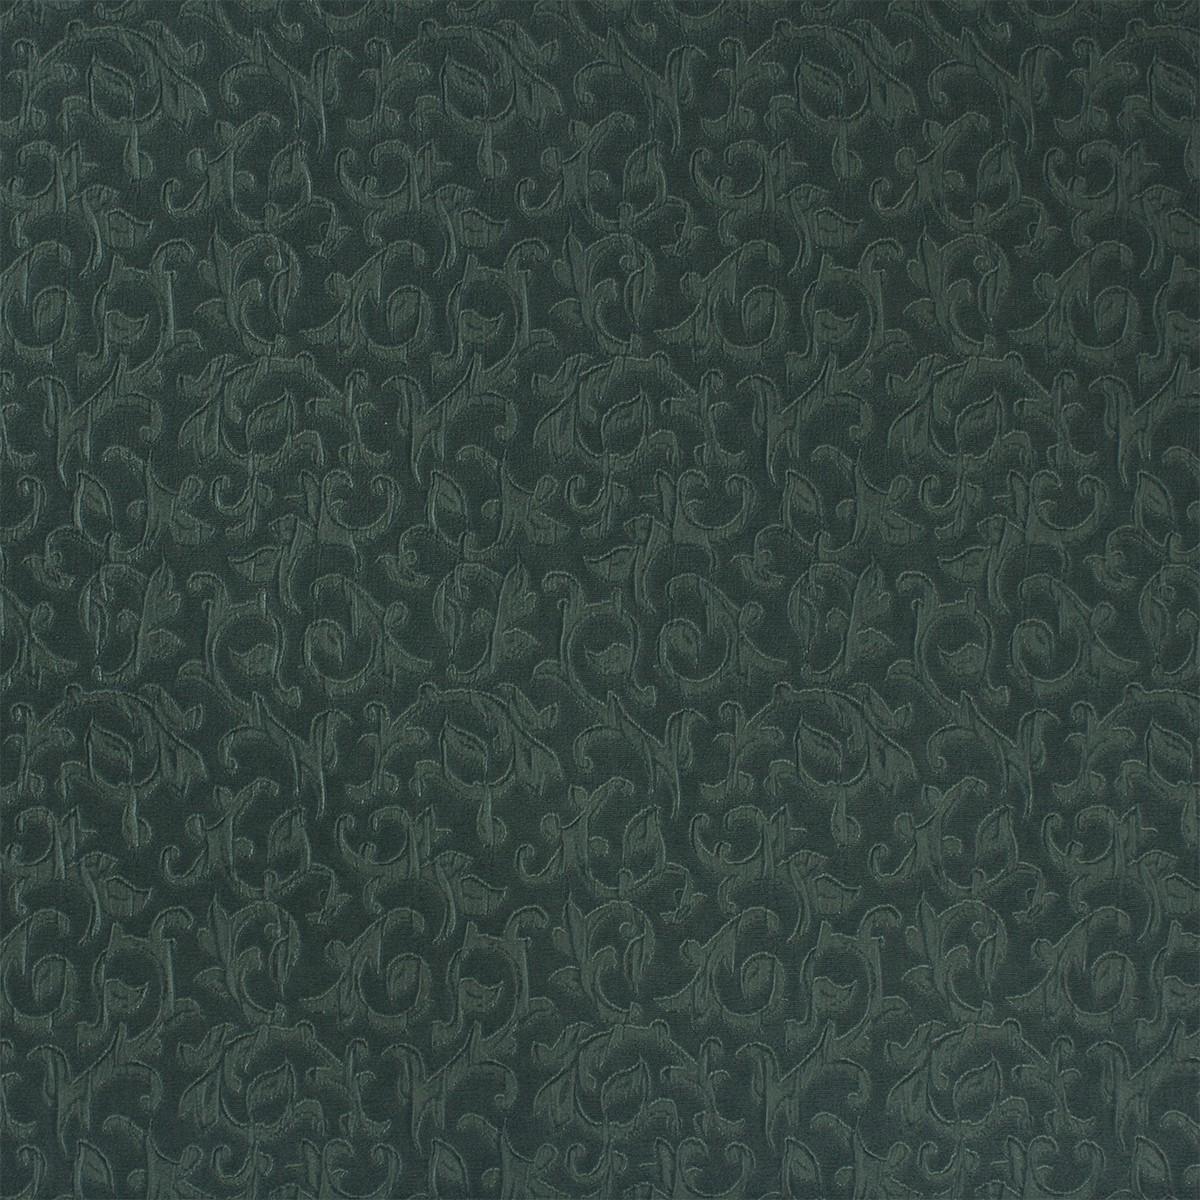 tapeten angelica uni barock grau t rkis tapete rasch textil 005386. Black Bedroom Furniture Sets. Home Design Ideas